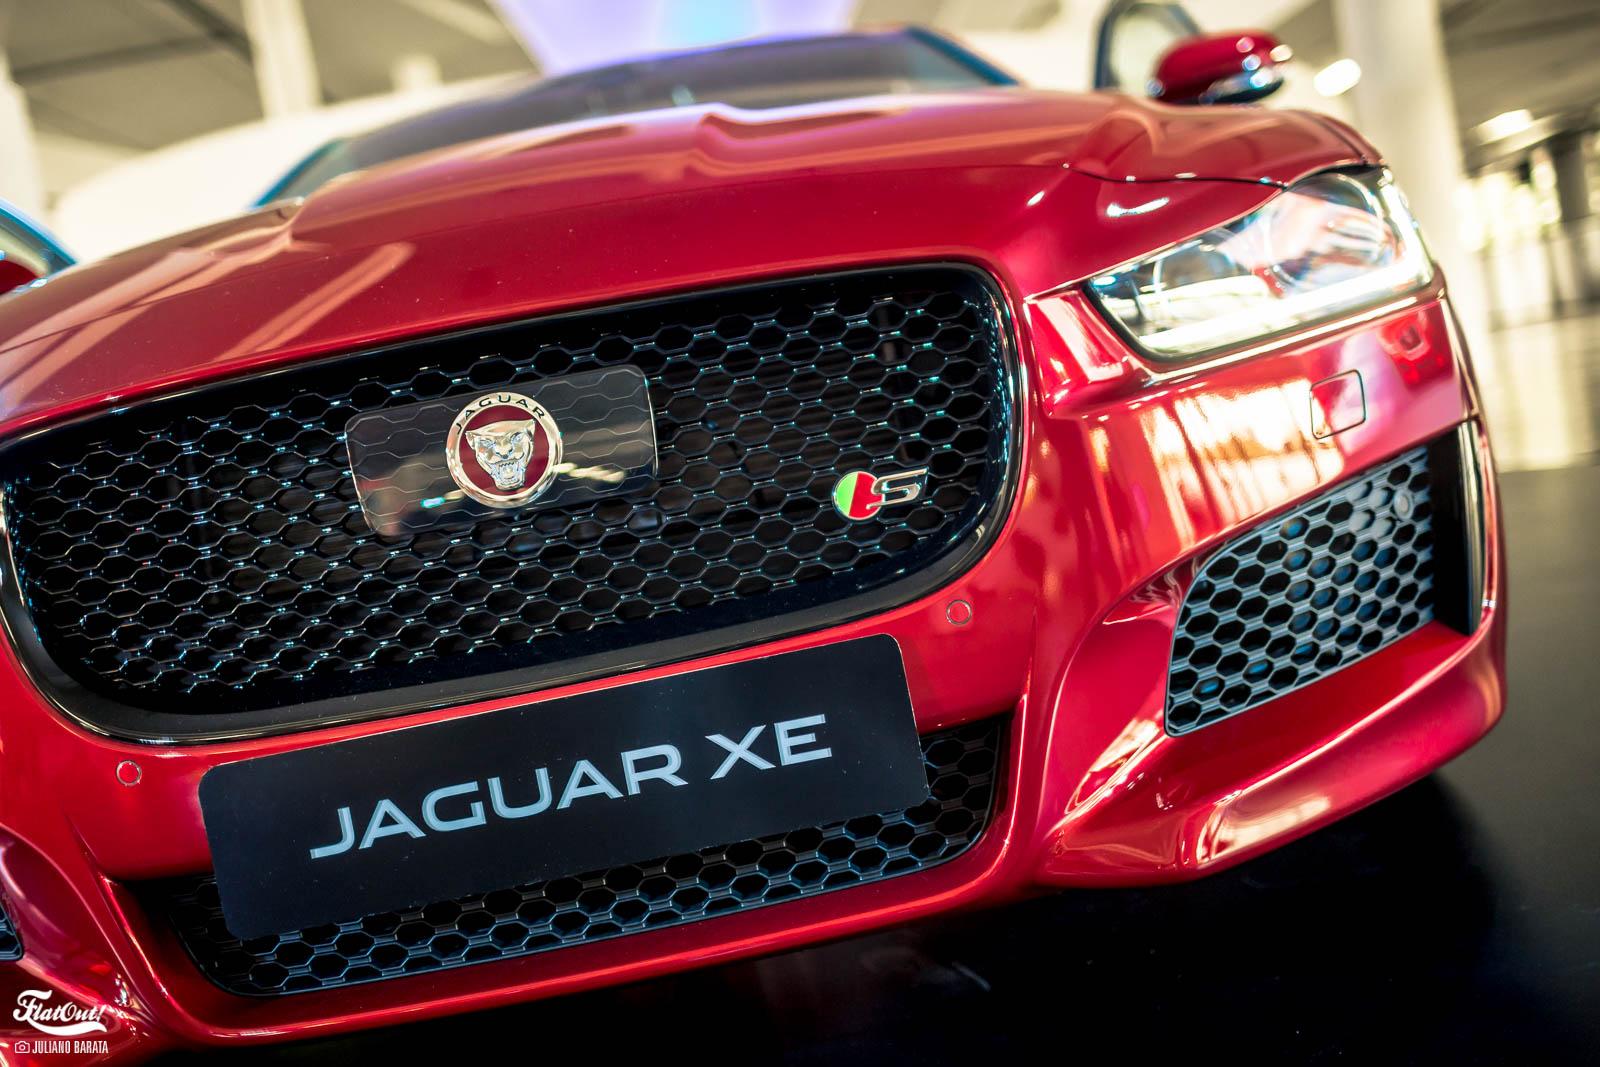 jaguar xe lan ado no brasil por a partir de r 170 mil. Black Bedroom Furniture Sets. Home Design Ideas